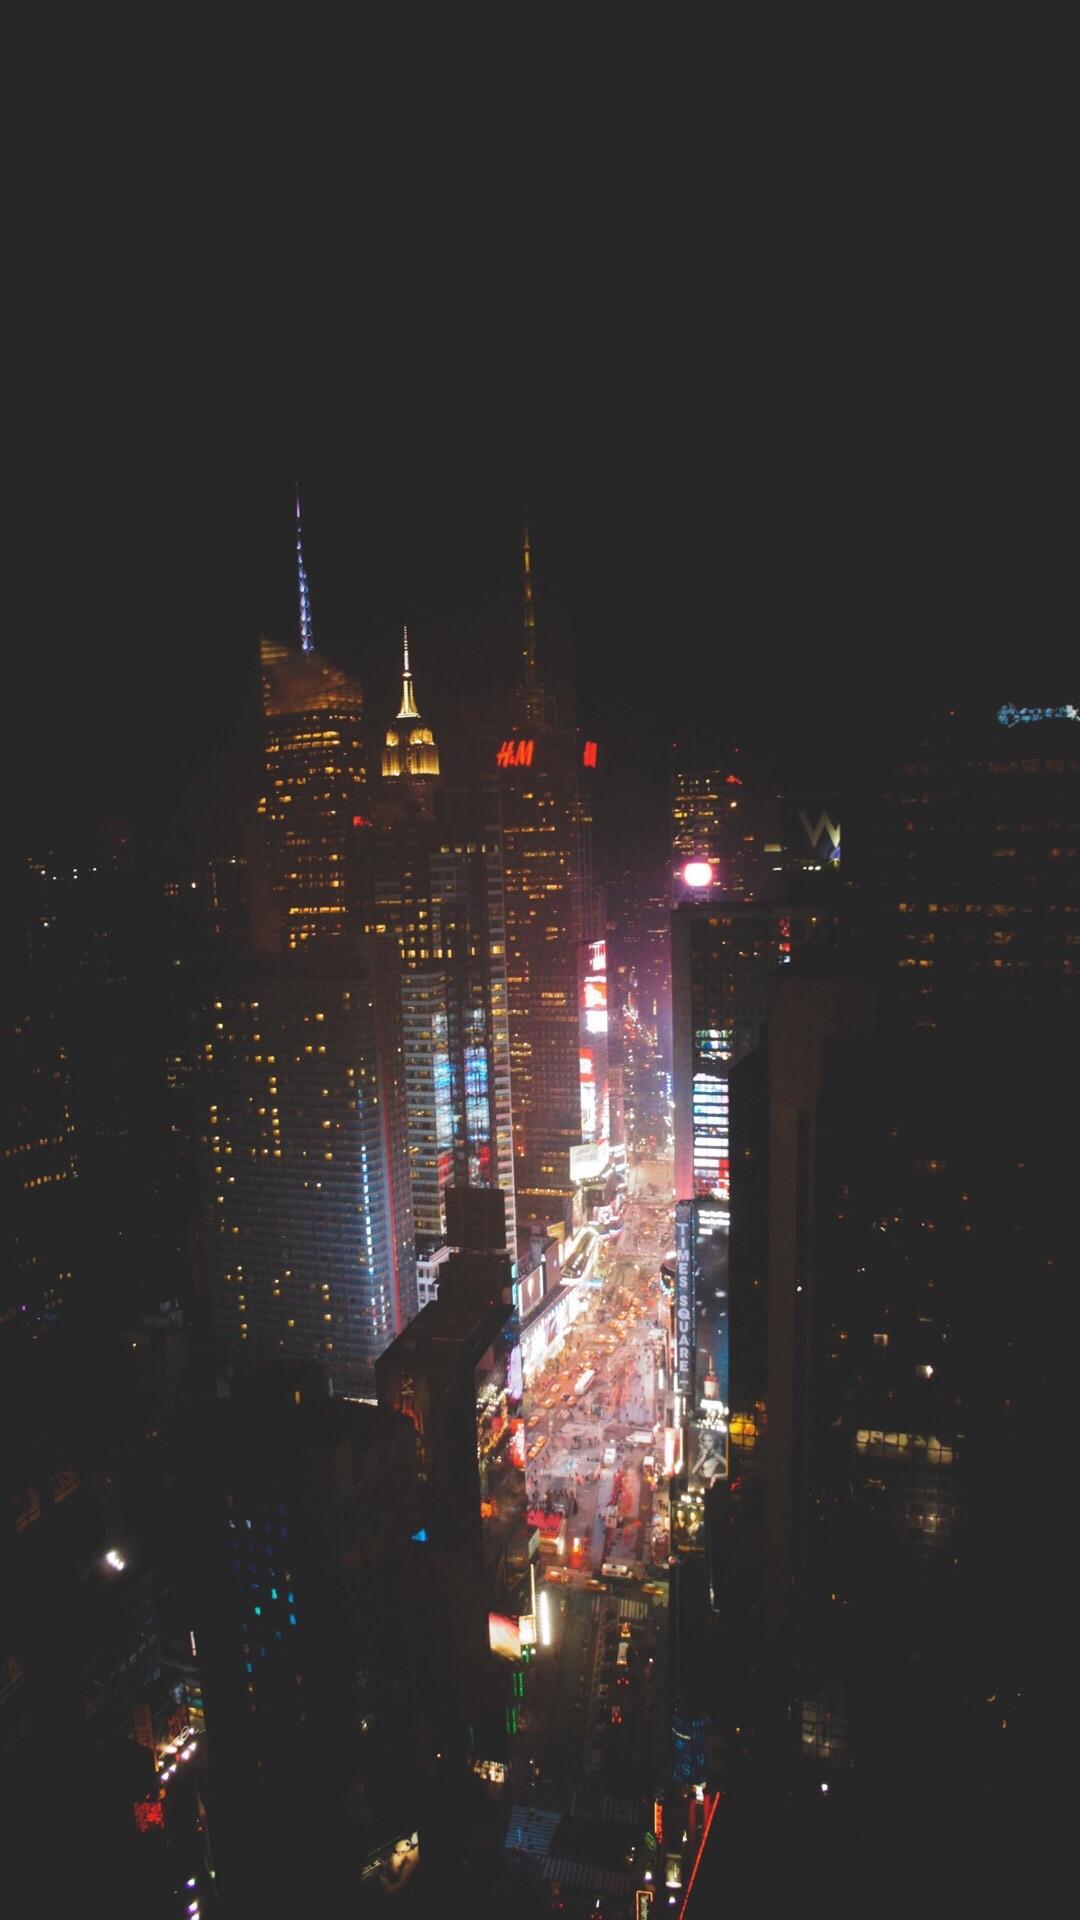 General 1080x1920 New York City building street light